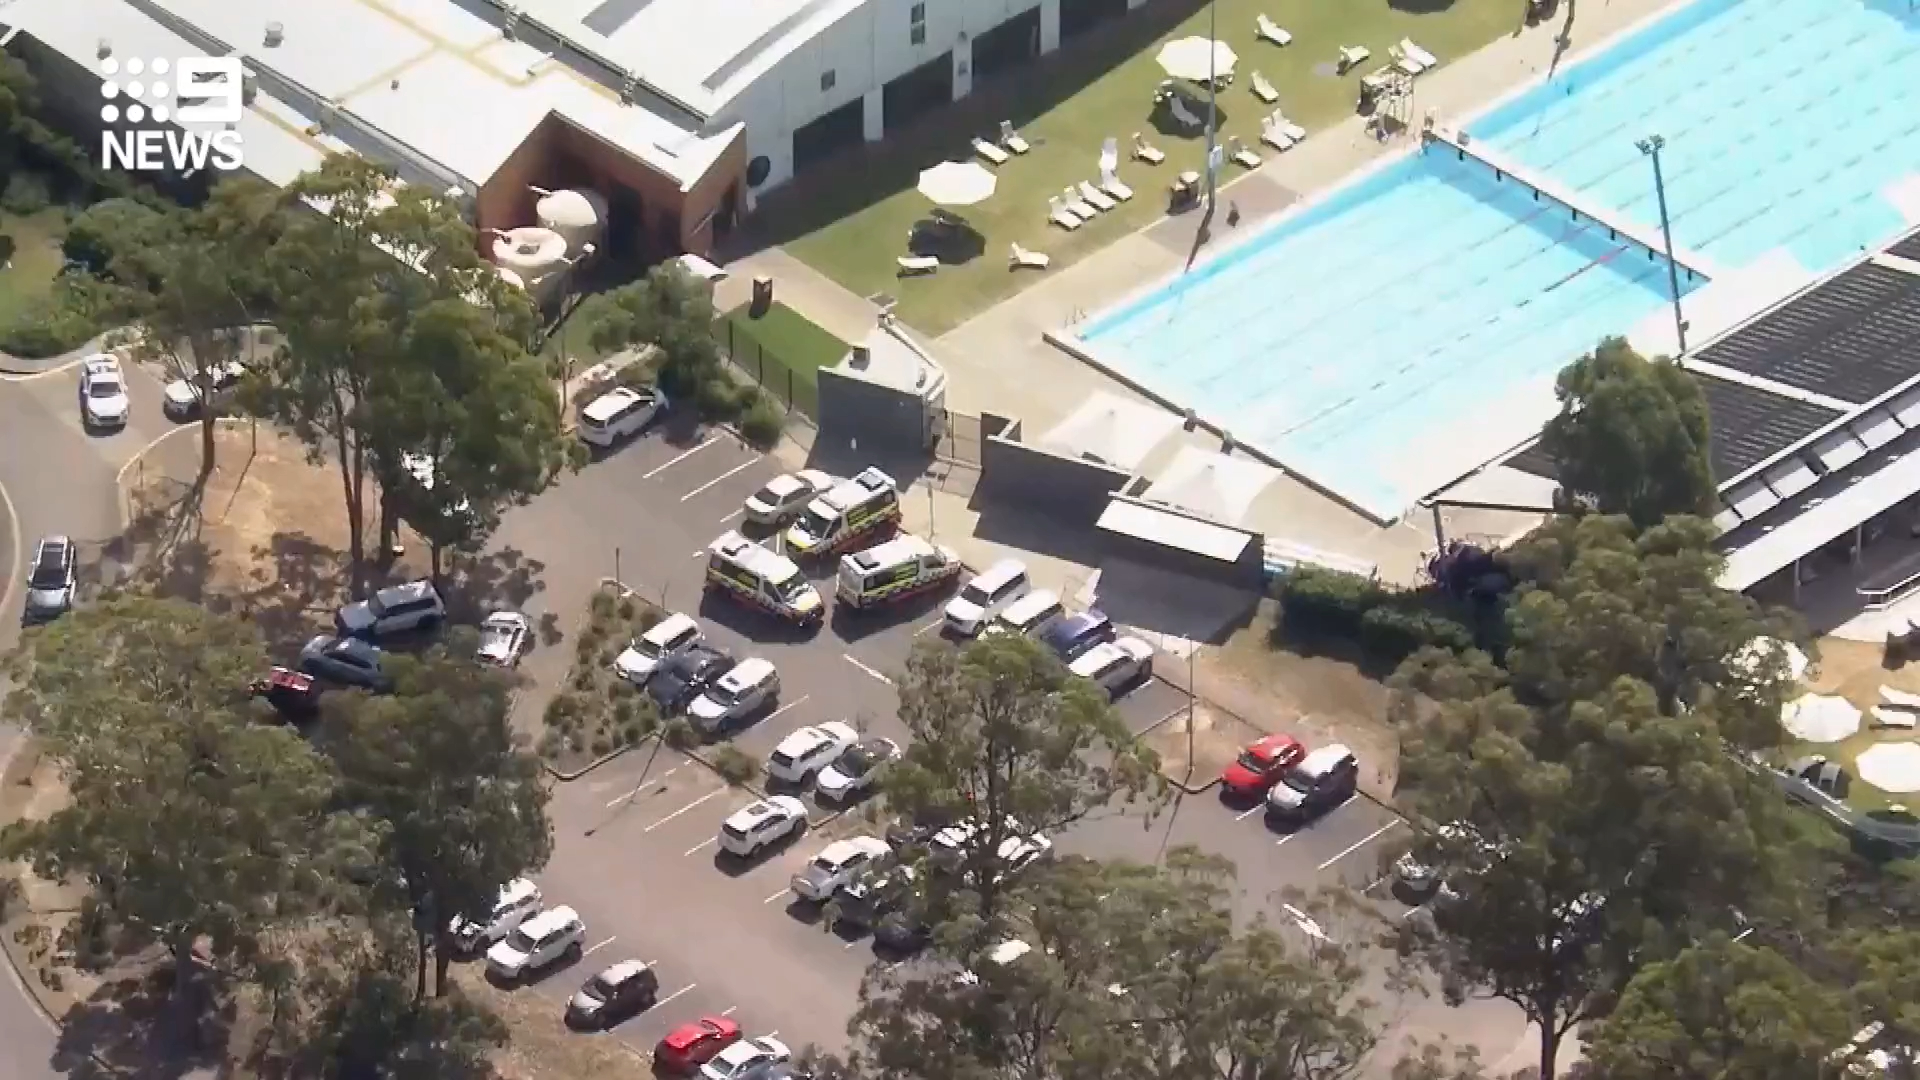 Near-drowning at Sydney pool